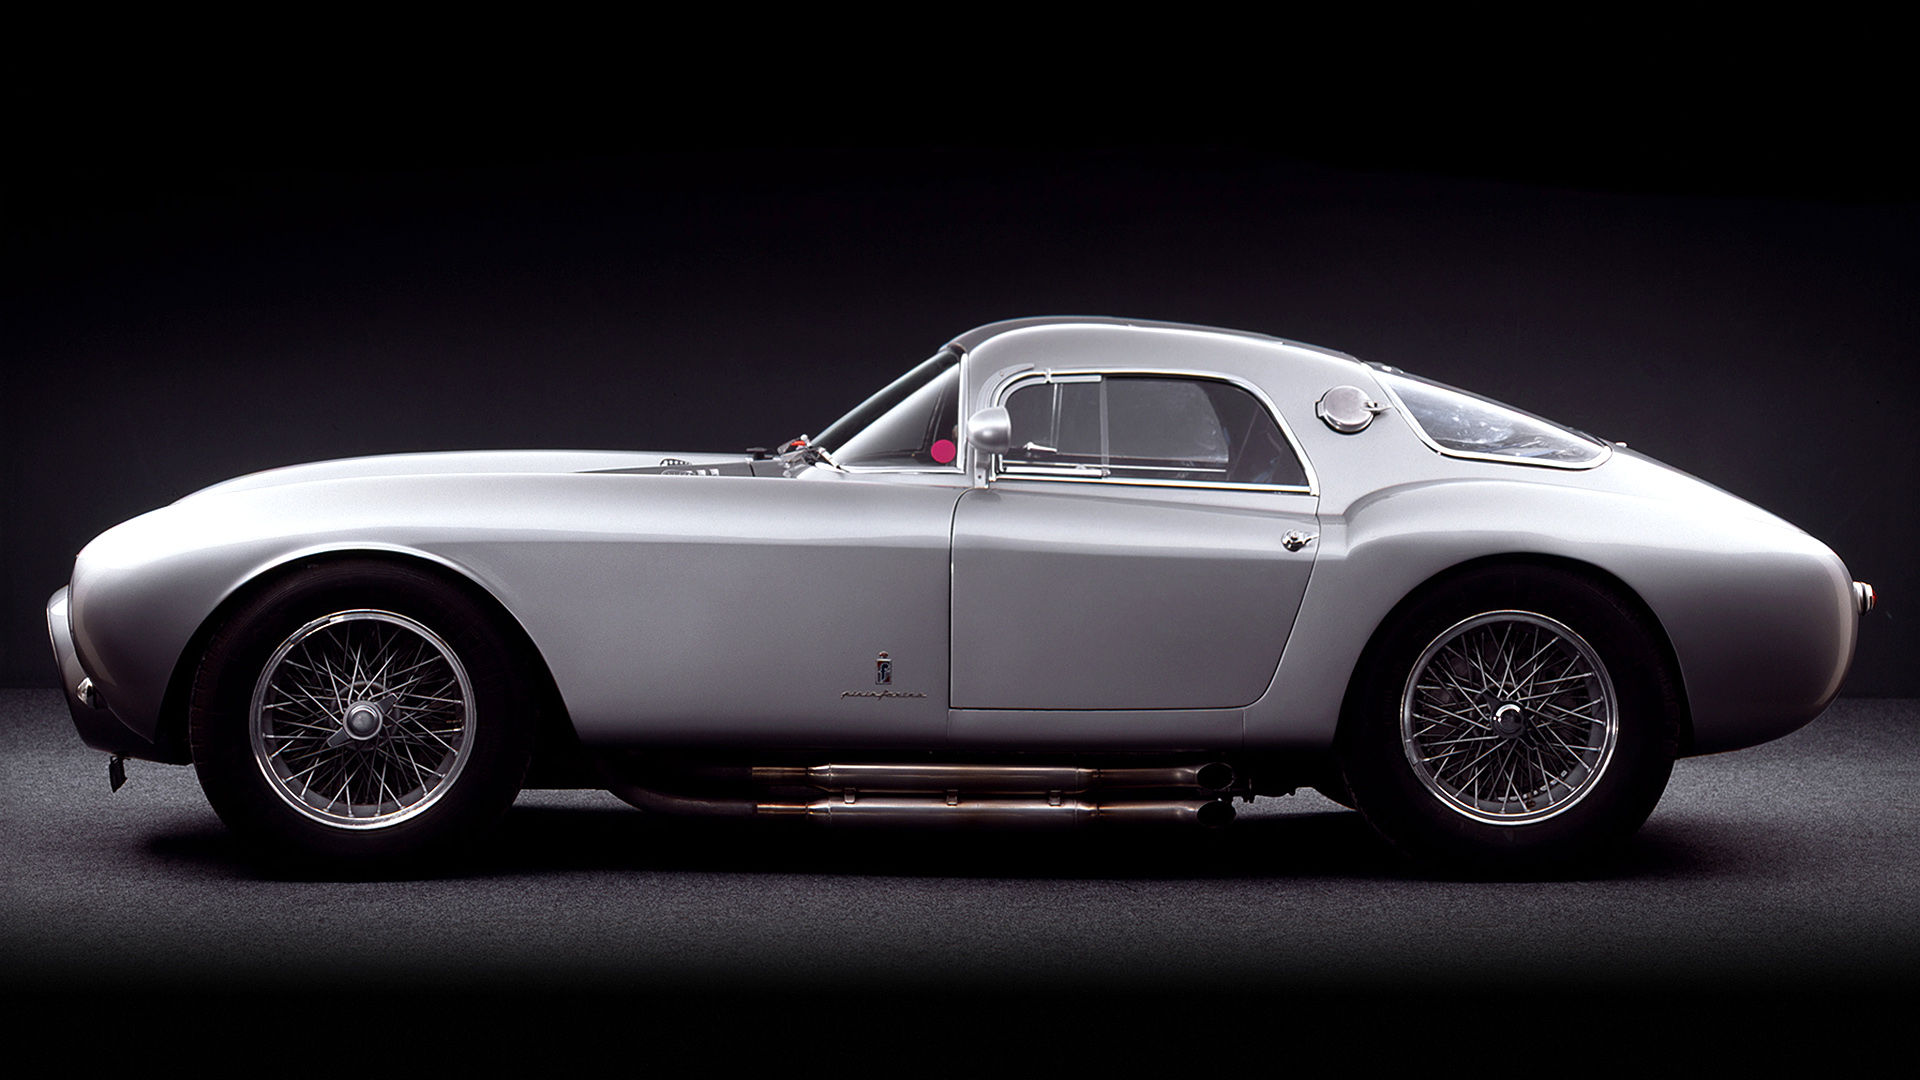 1954 Maserati A6GCS Berlinetta